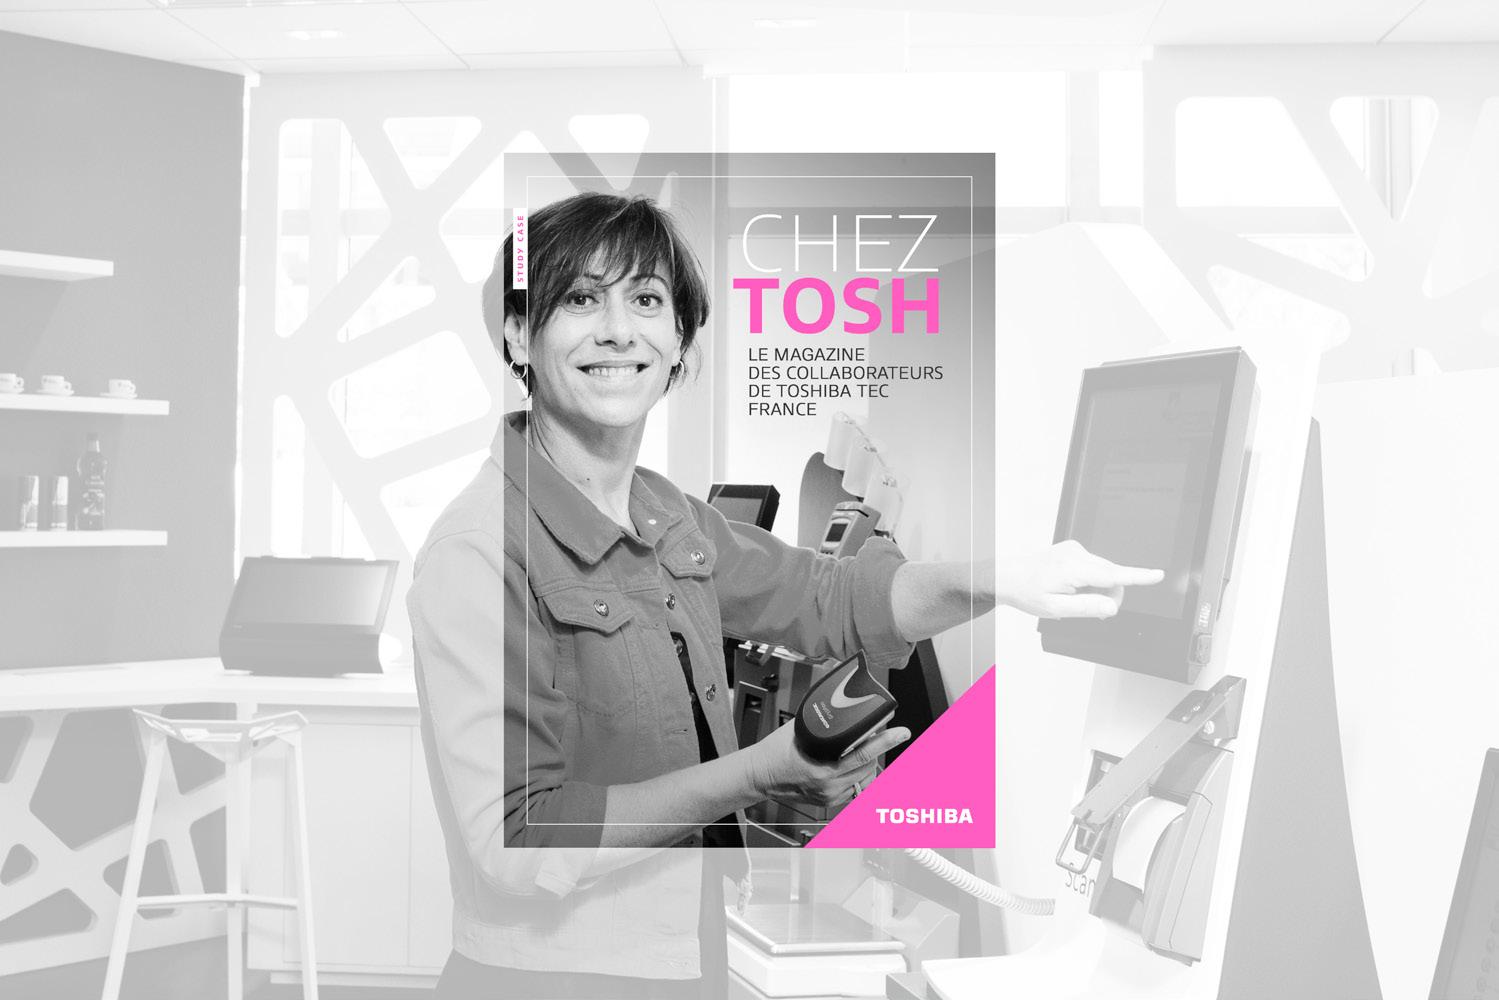 Cheztosh Toshiba 1